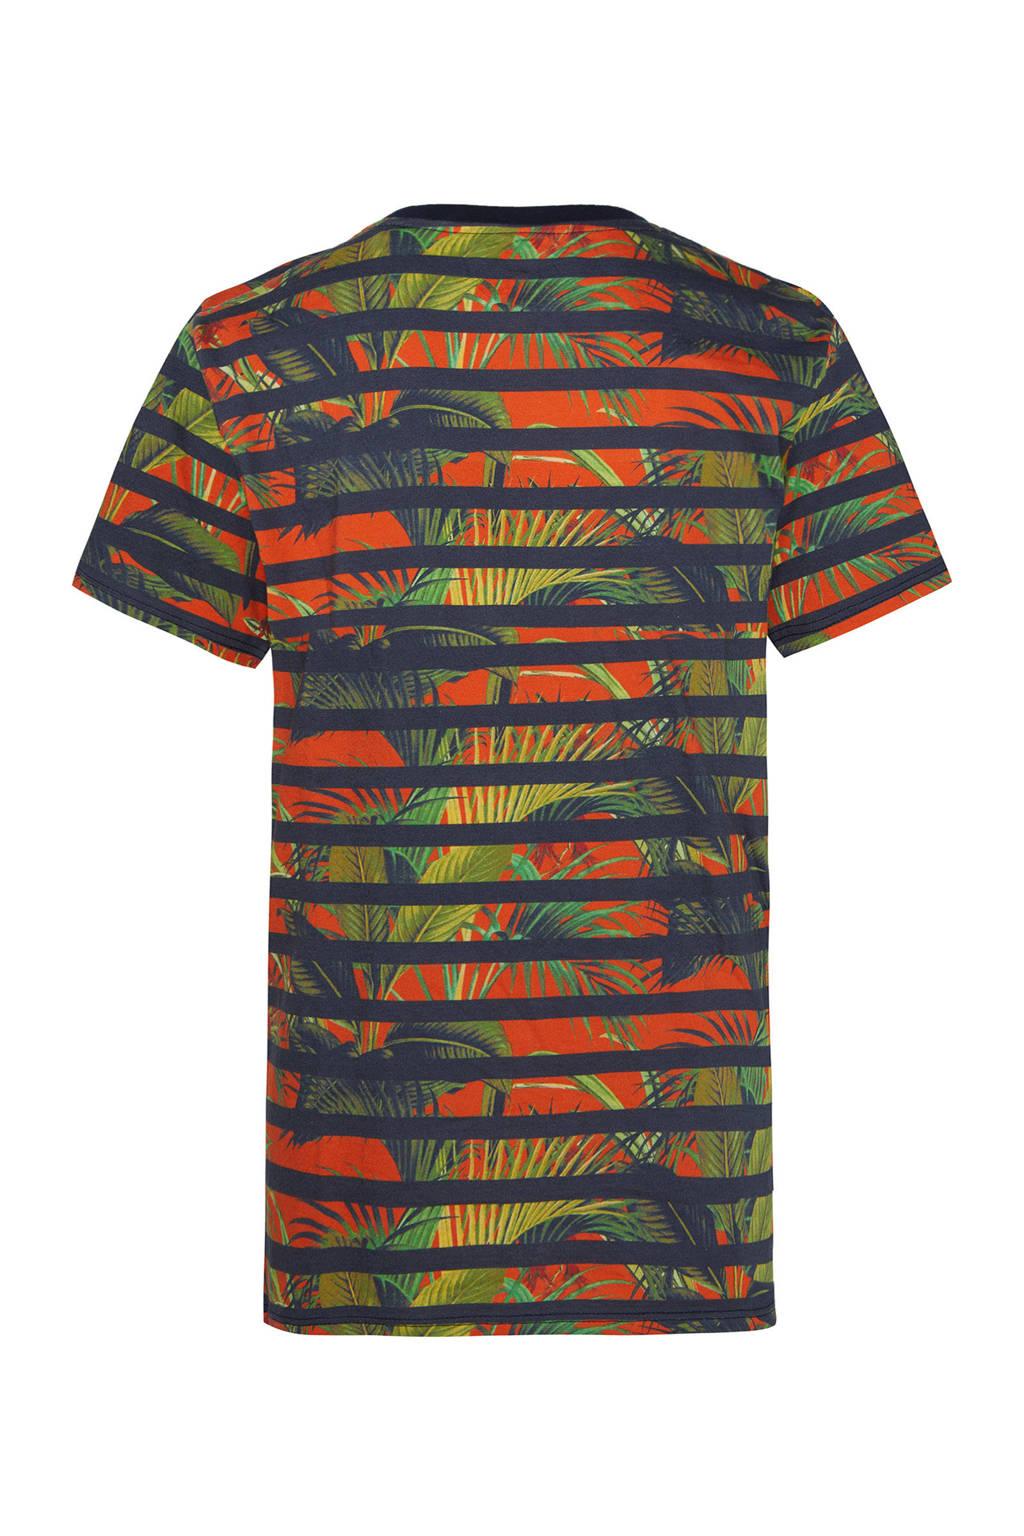 WE Fashion gestreept regular fit T-shirt donkerblauw/rood/groen, Donkerblauw/rood/groen